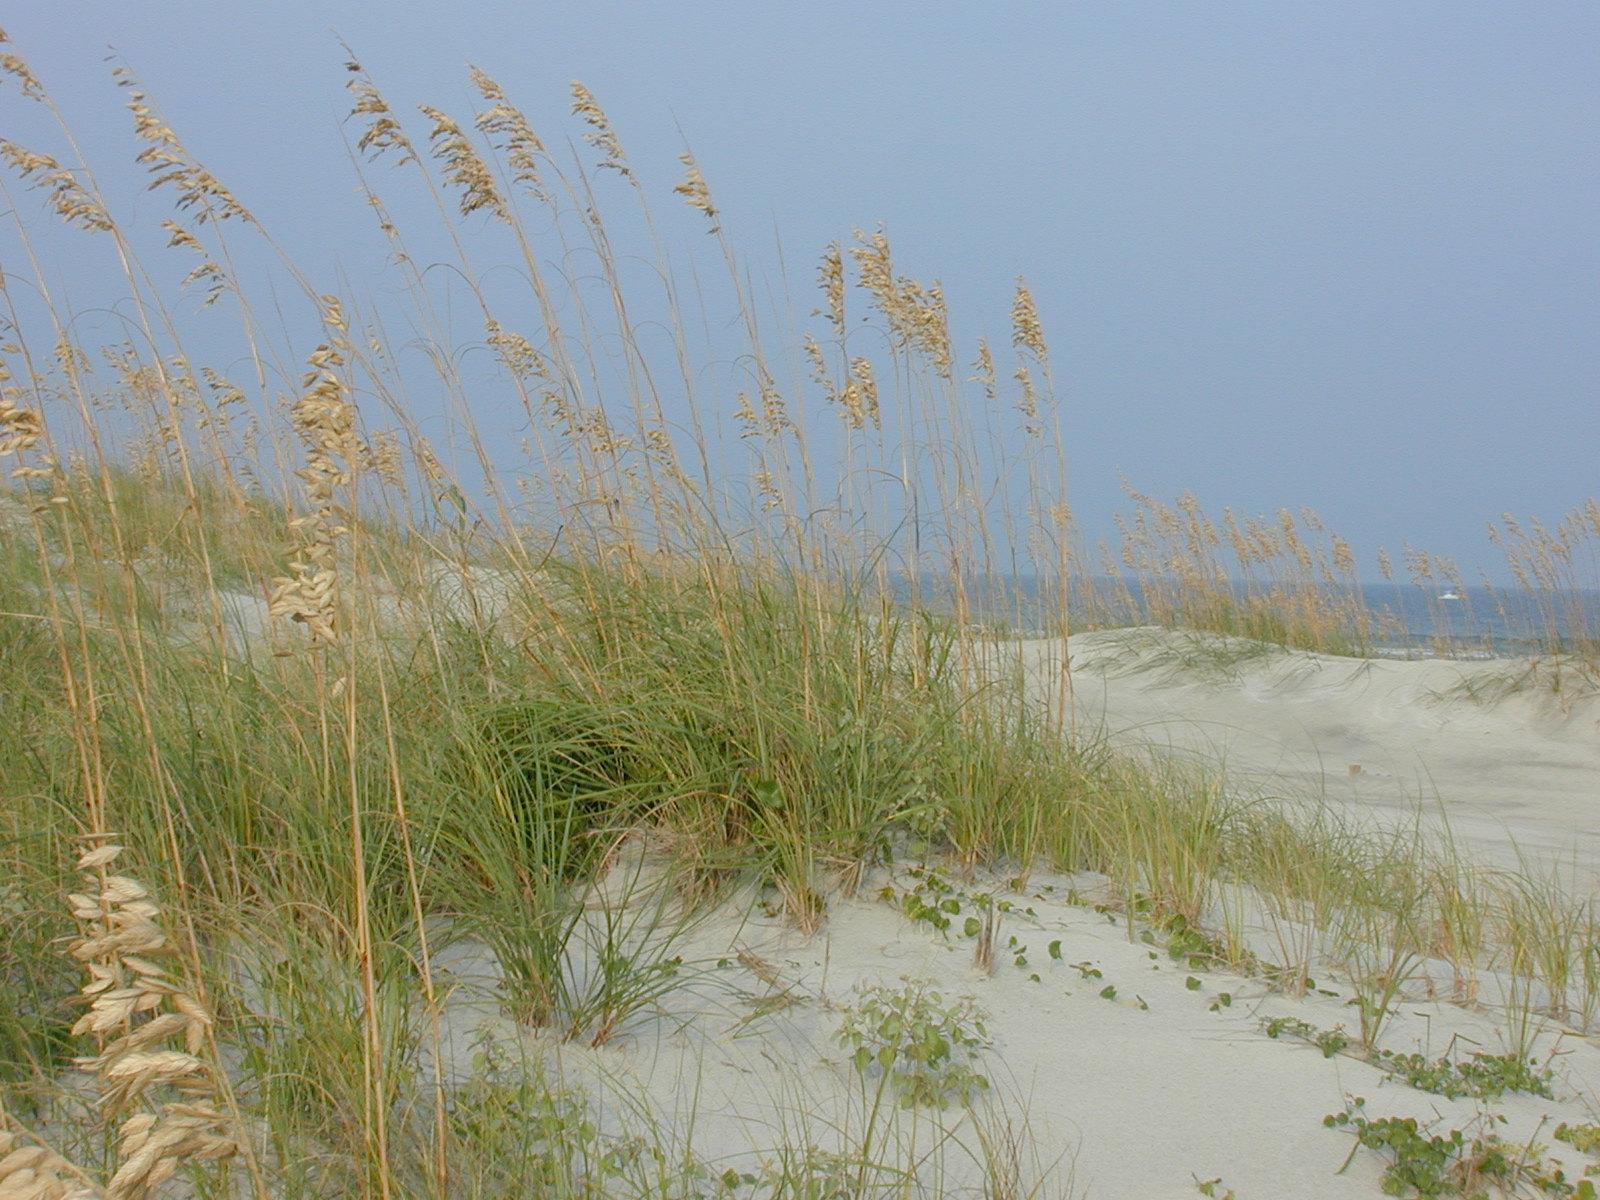 Ocean Dunes by JennyM-Pics